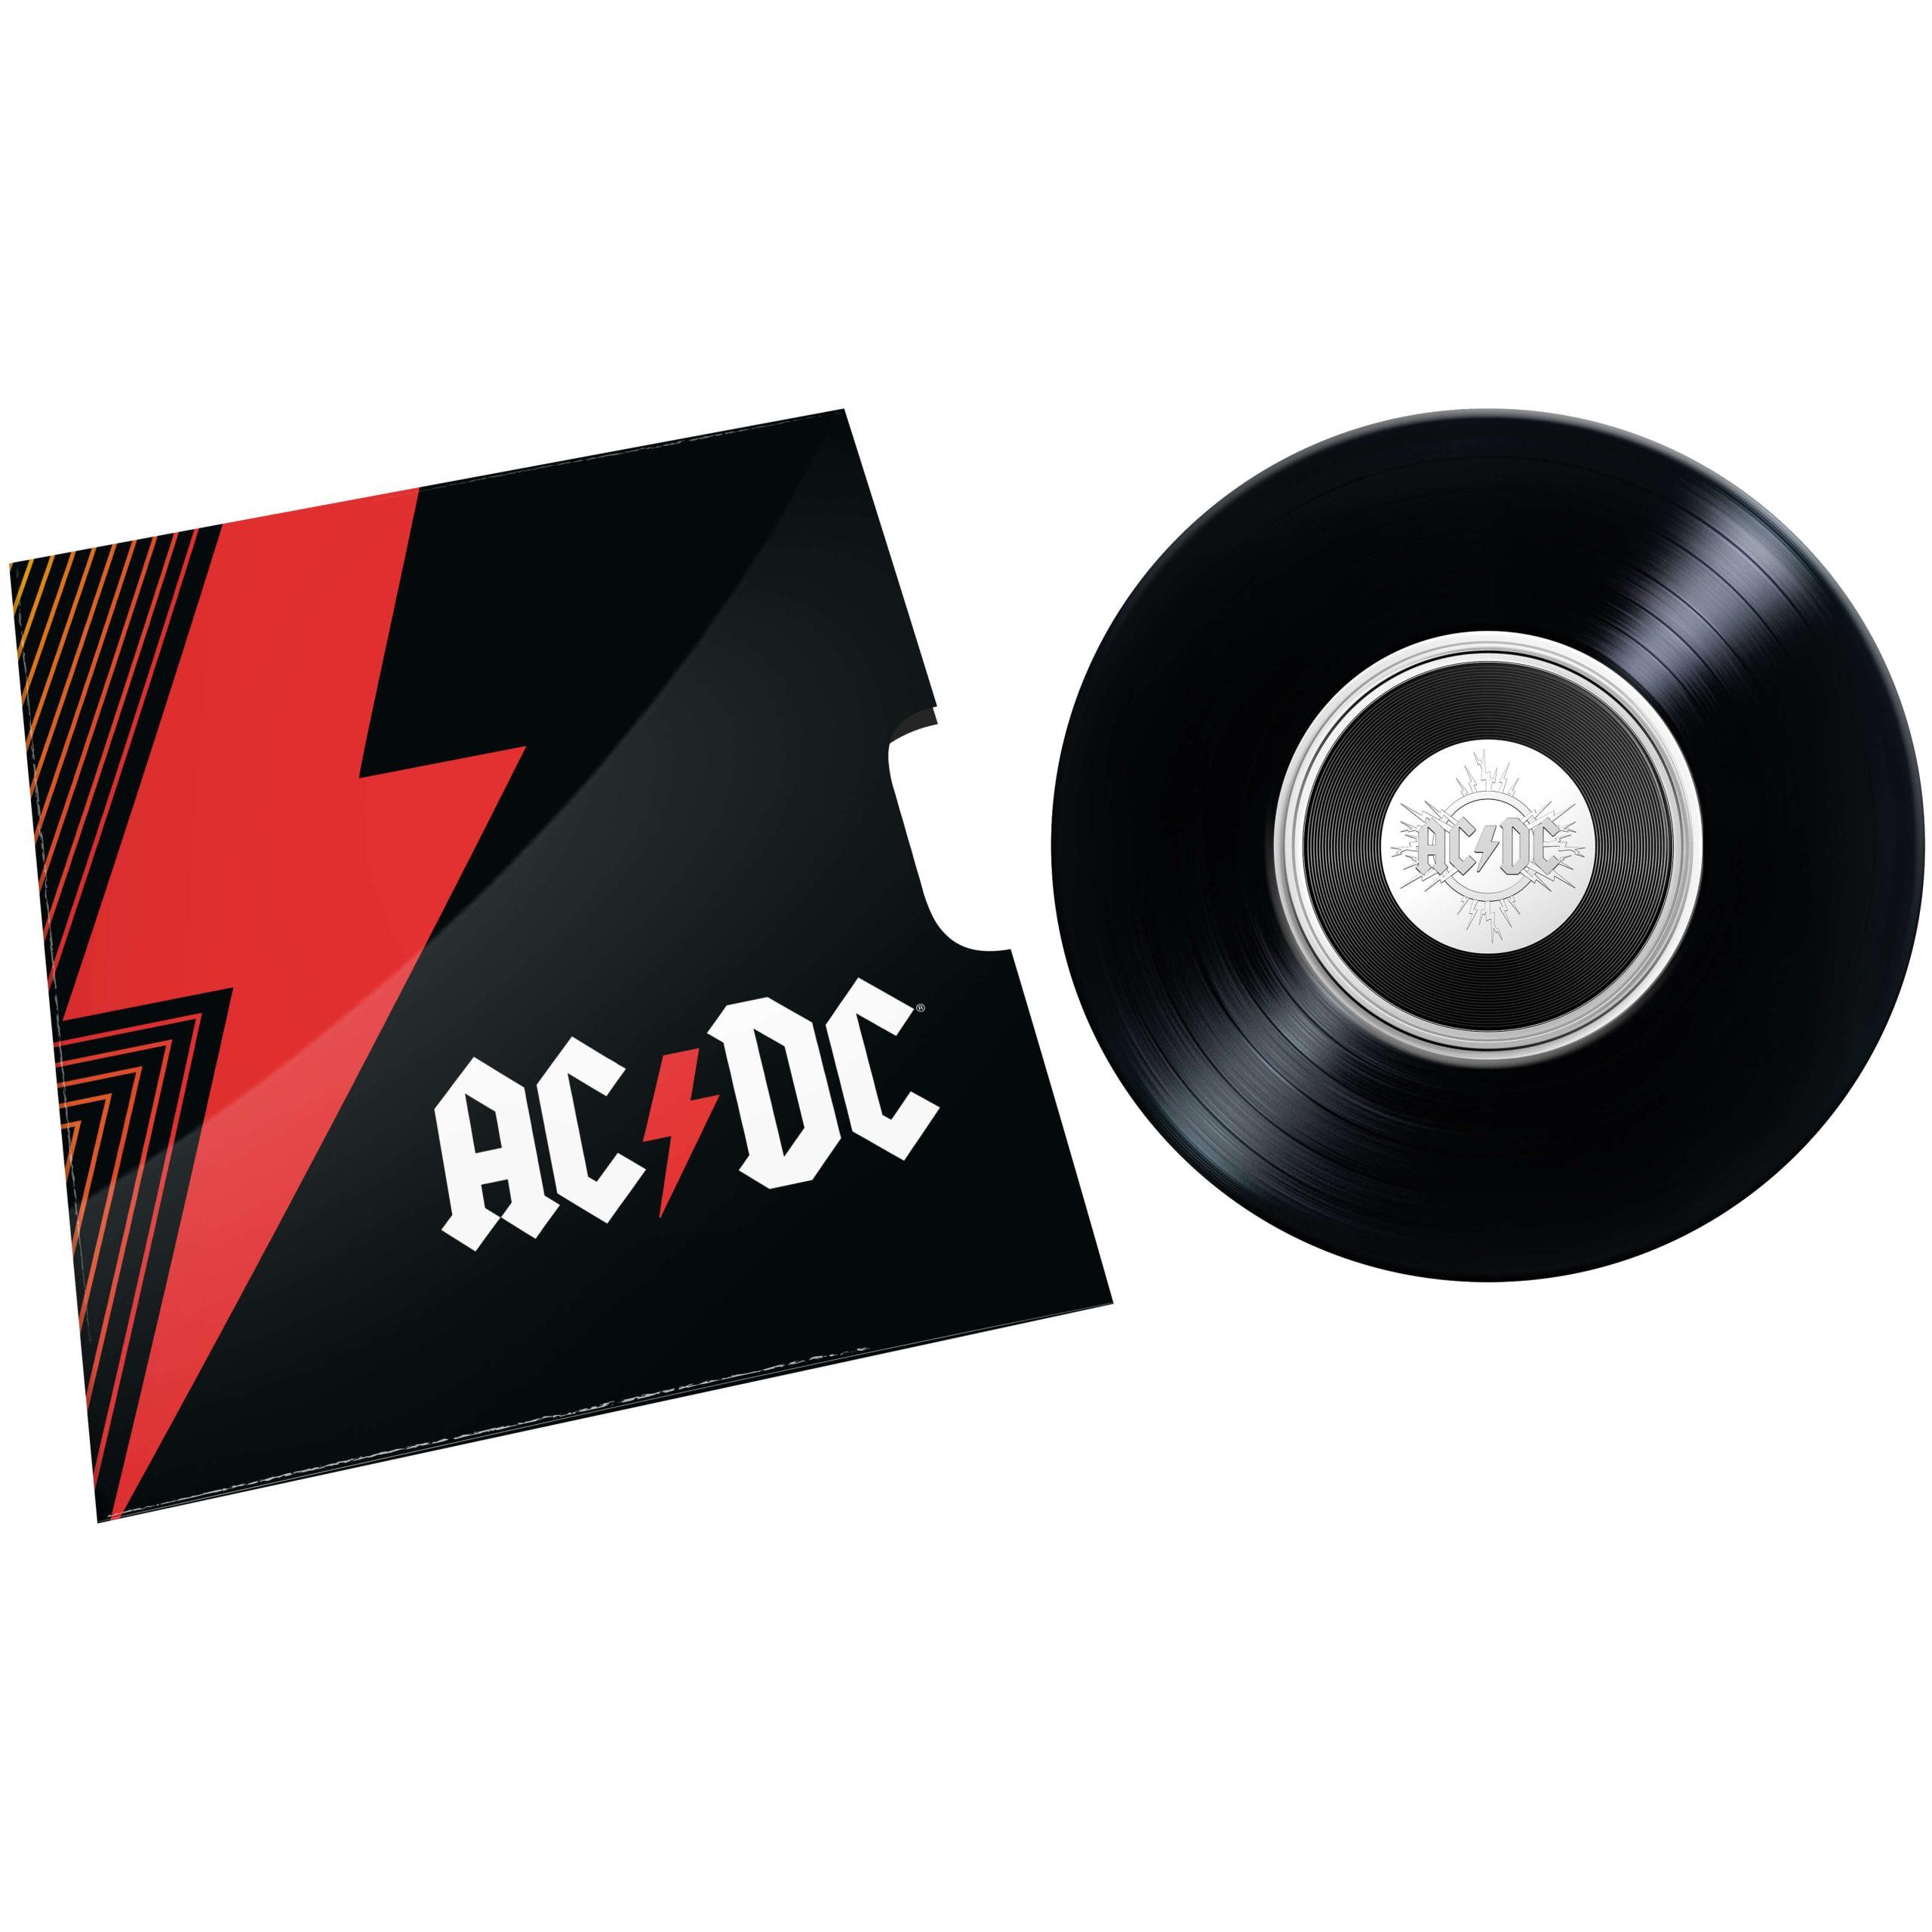 2020/2021 - AC/DC Seven Coin Collection - 20c Coloured CuNi Unc Coins 13